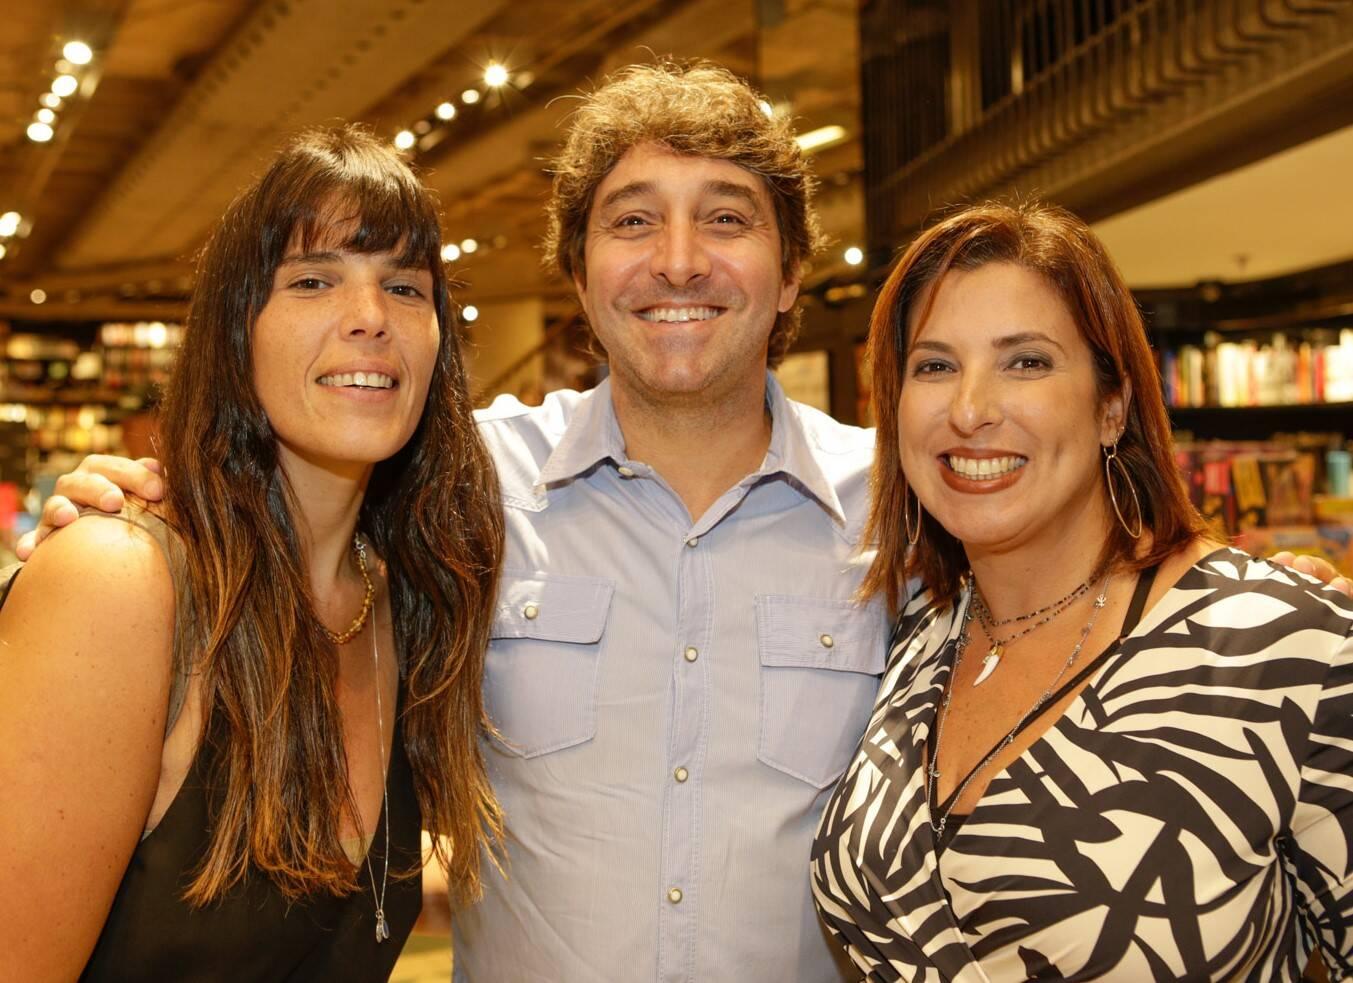 Fernanda Thedim, Luiz Alzer e Maria Vargas  /Foto: Gianne Carvalho